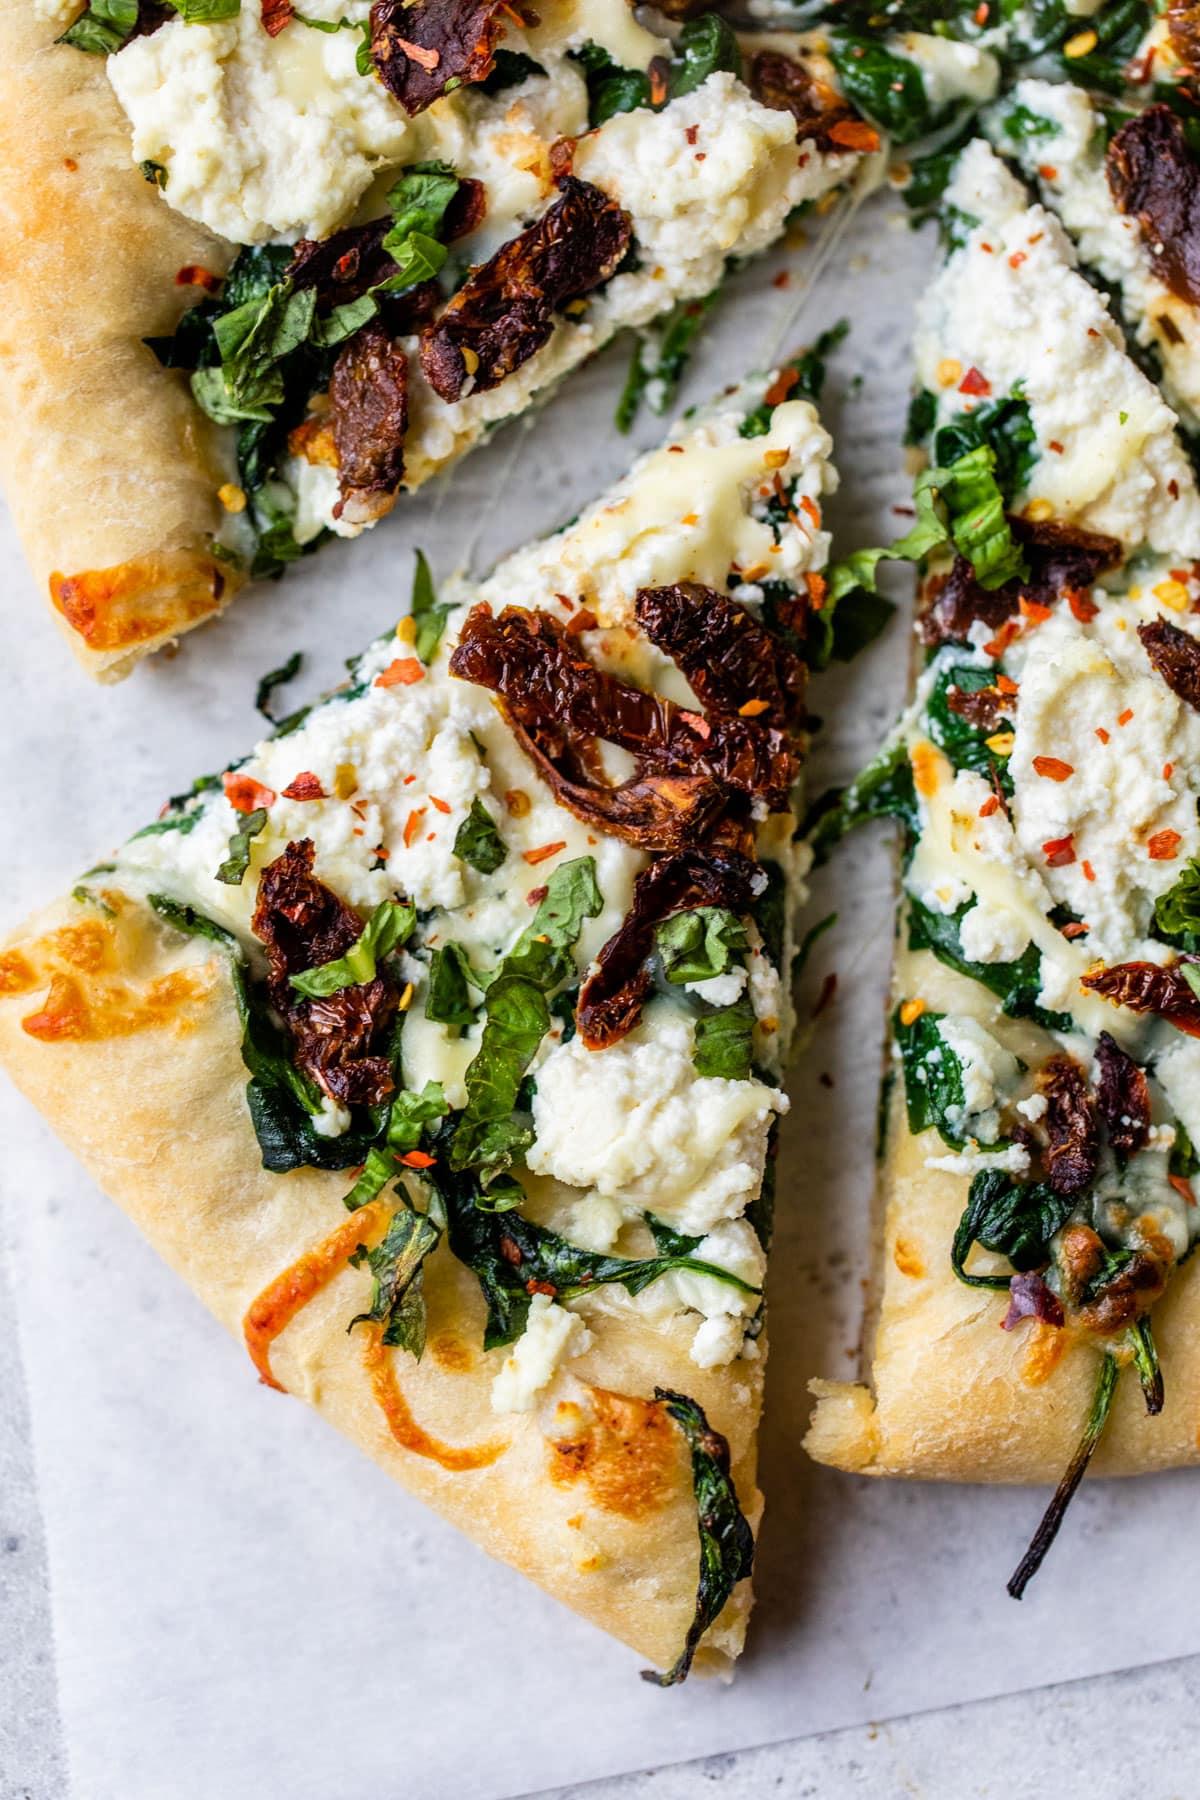 Ricotta Pizza with Peaches